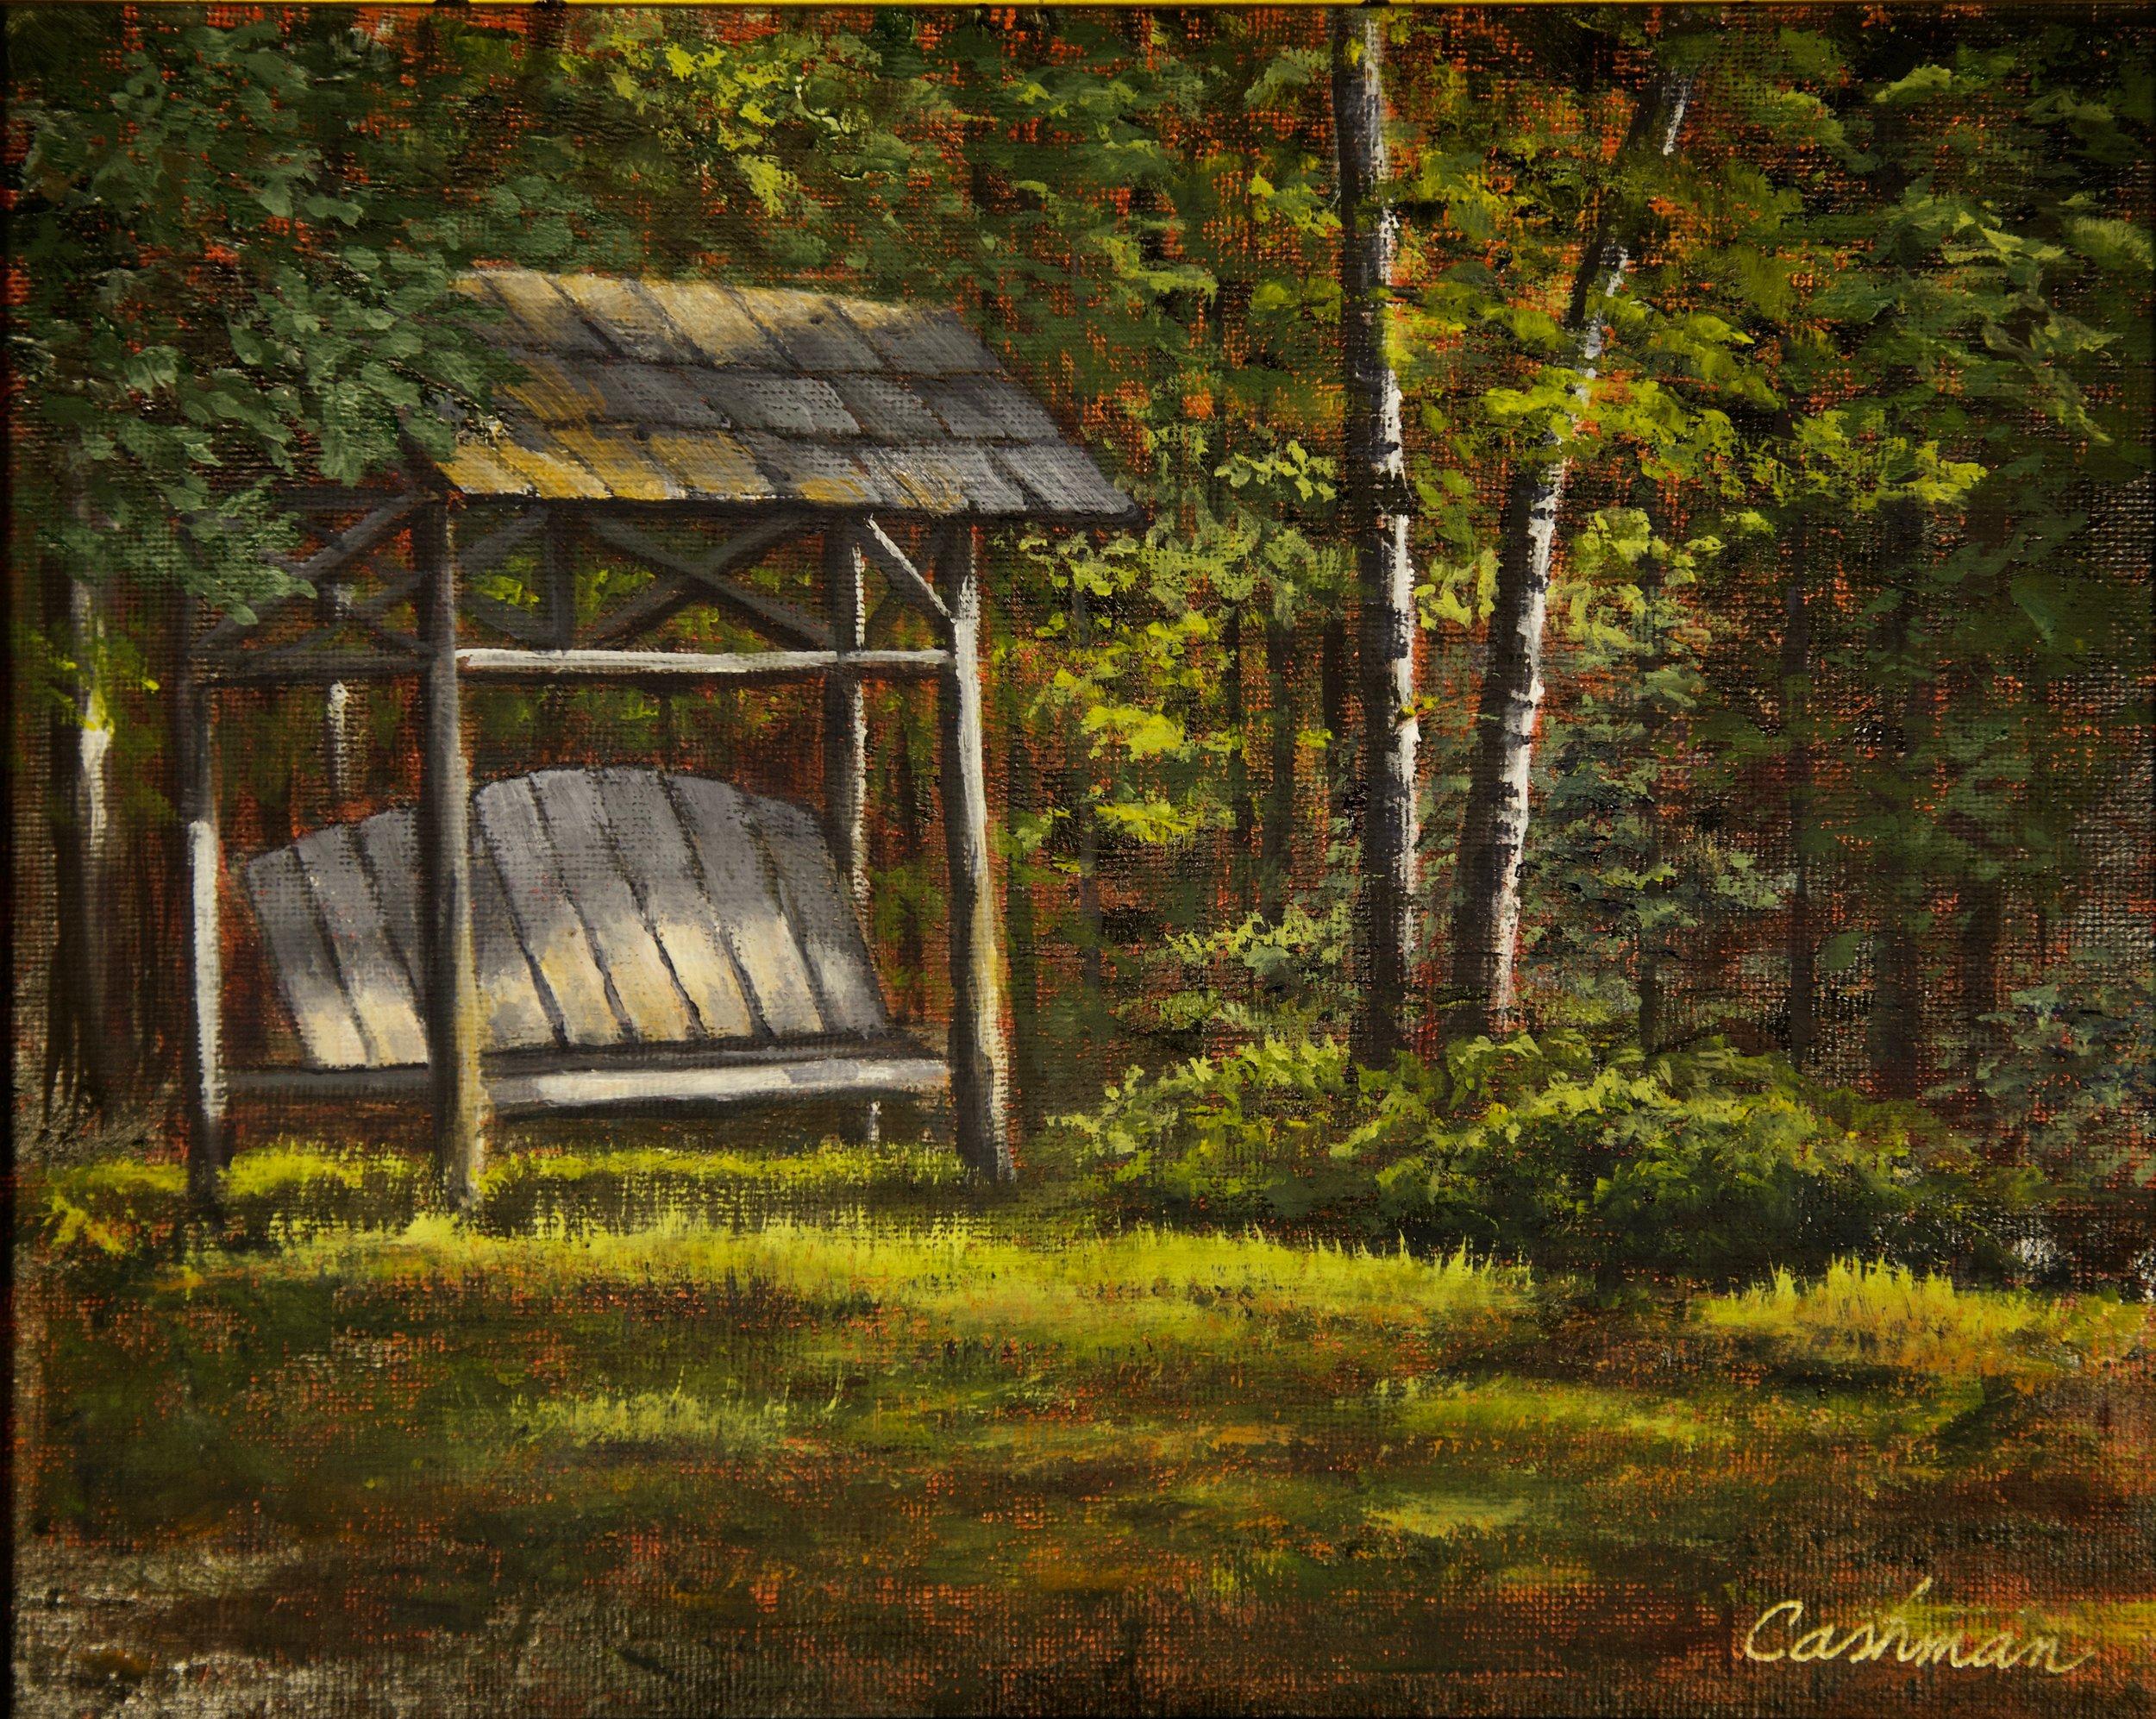 Deep Shadows at Cedaroma Lodge